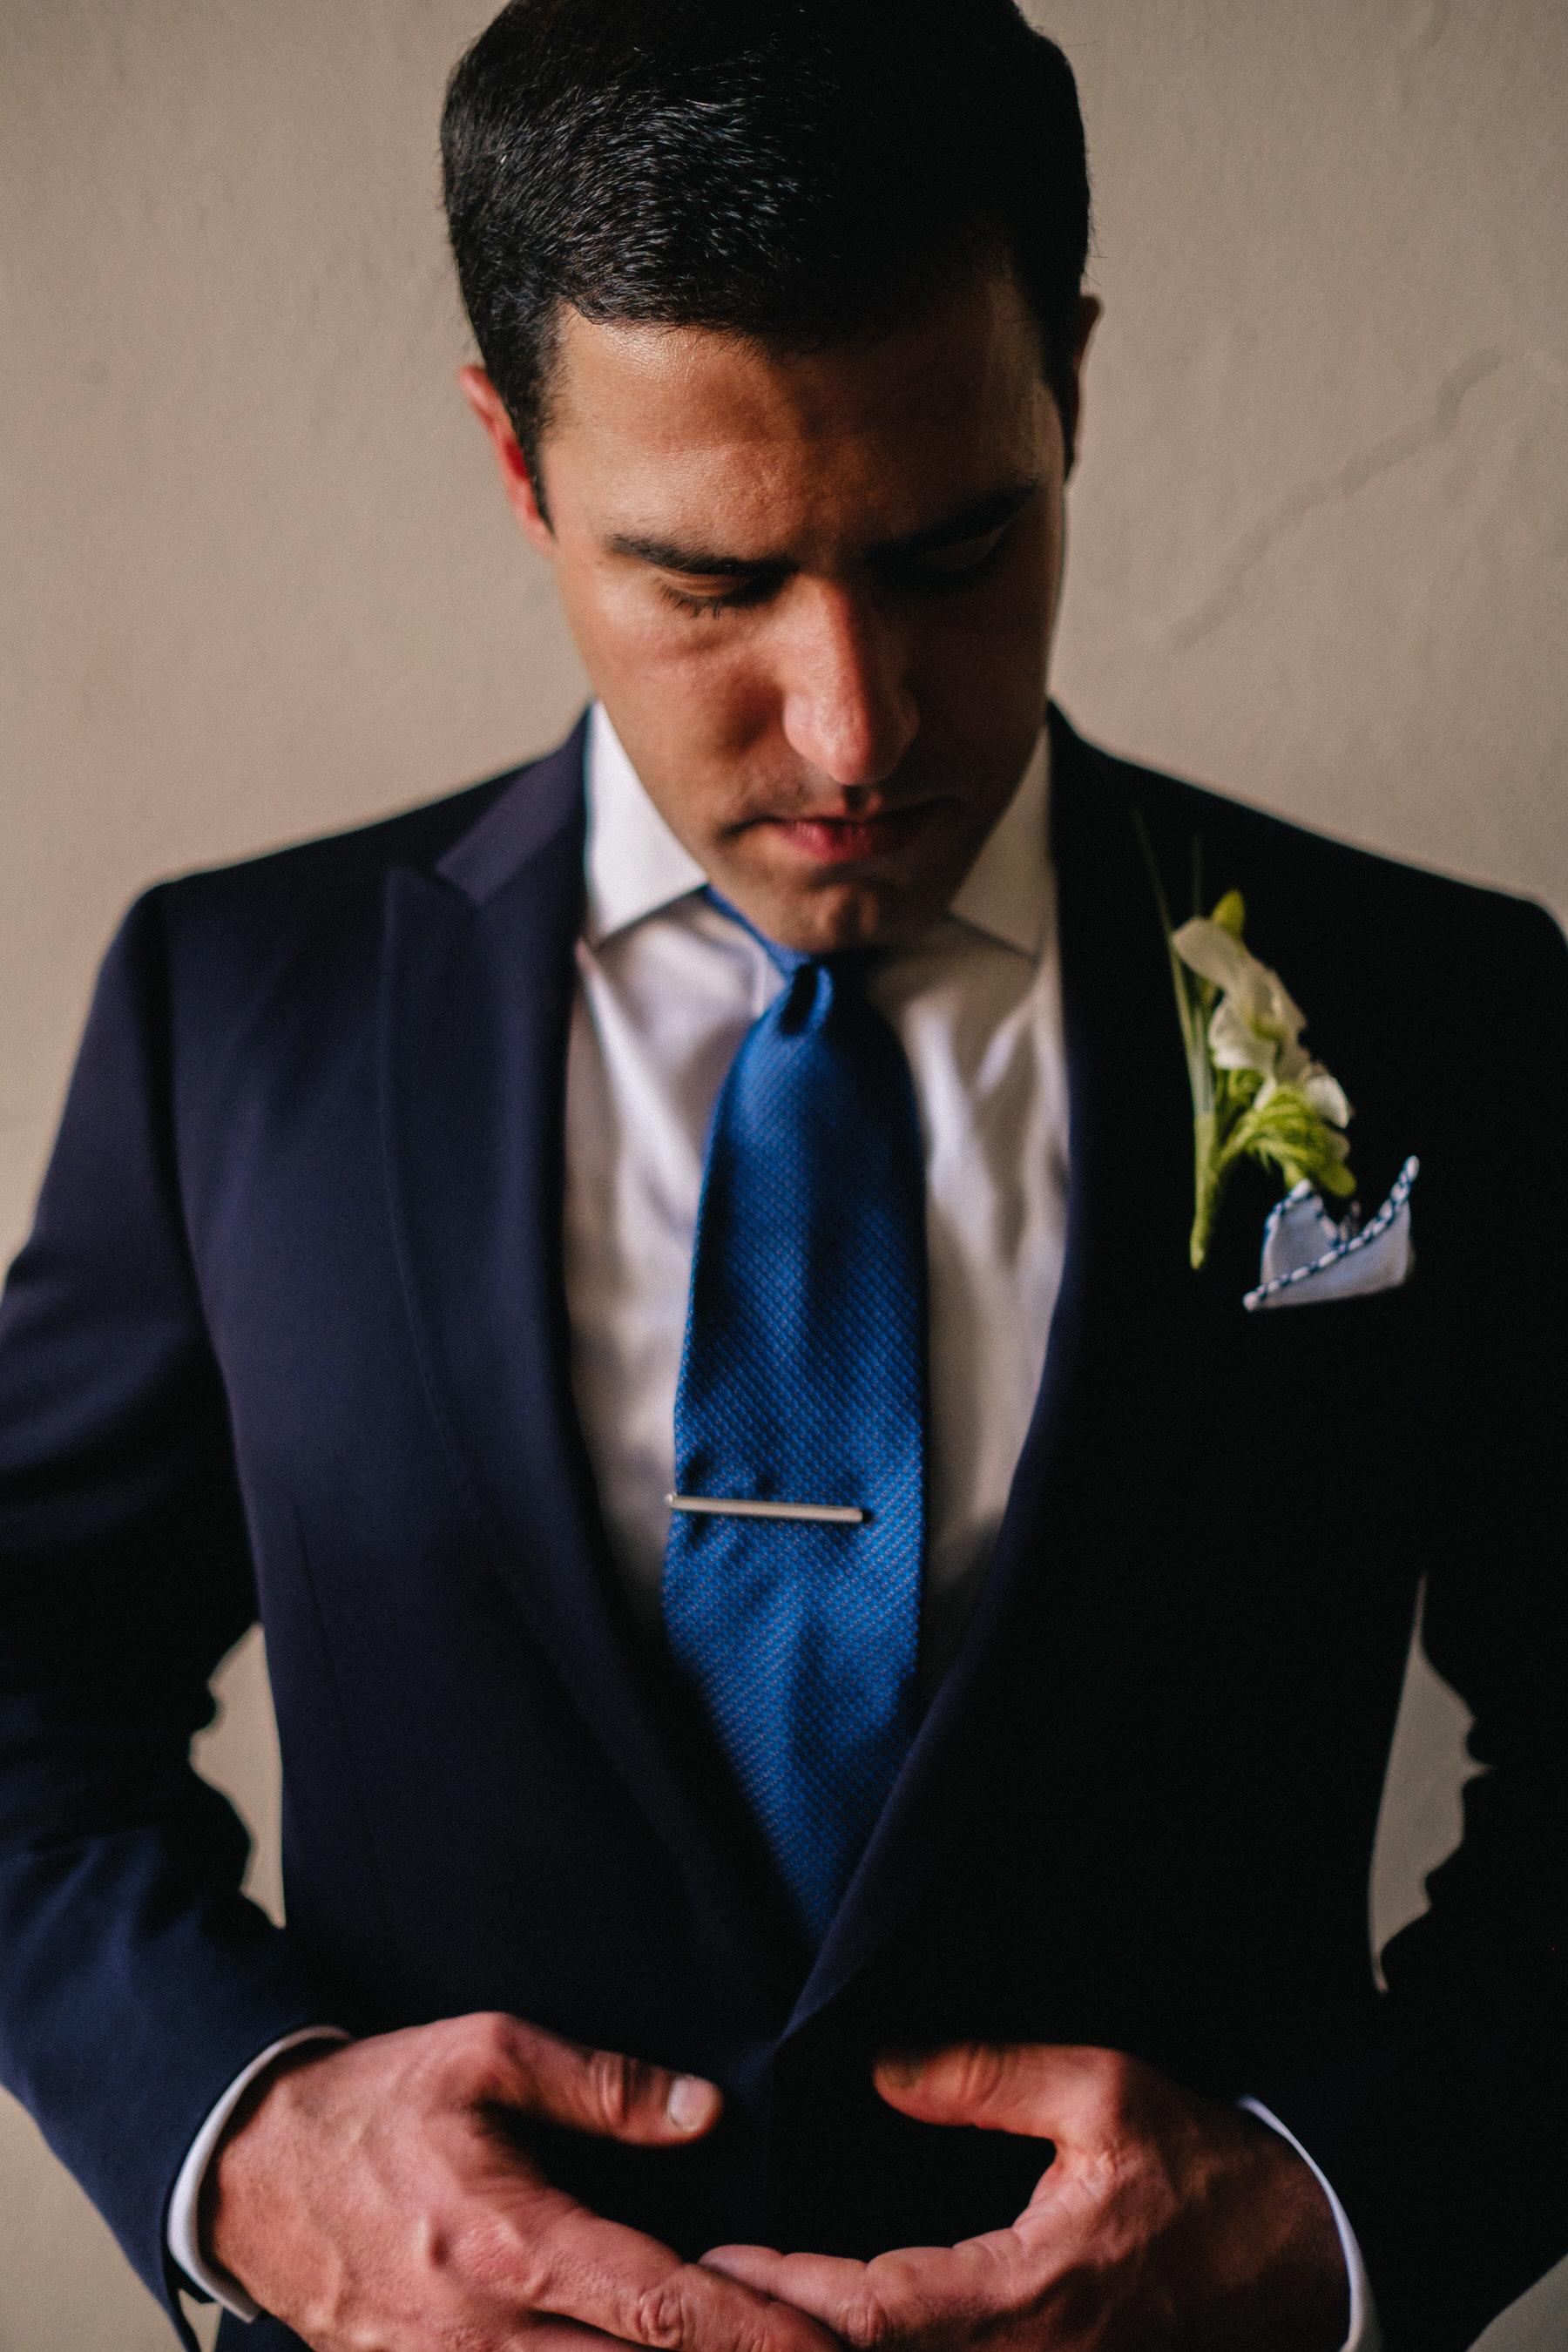 Oxford_mississippi_wedding_photographer_032.jpg